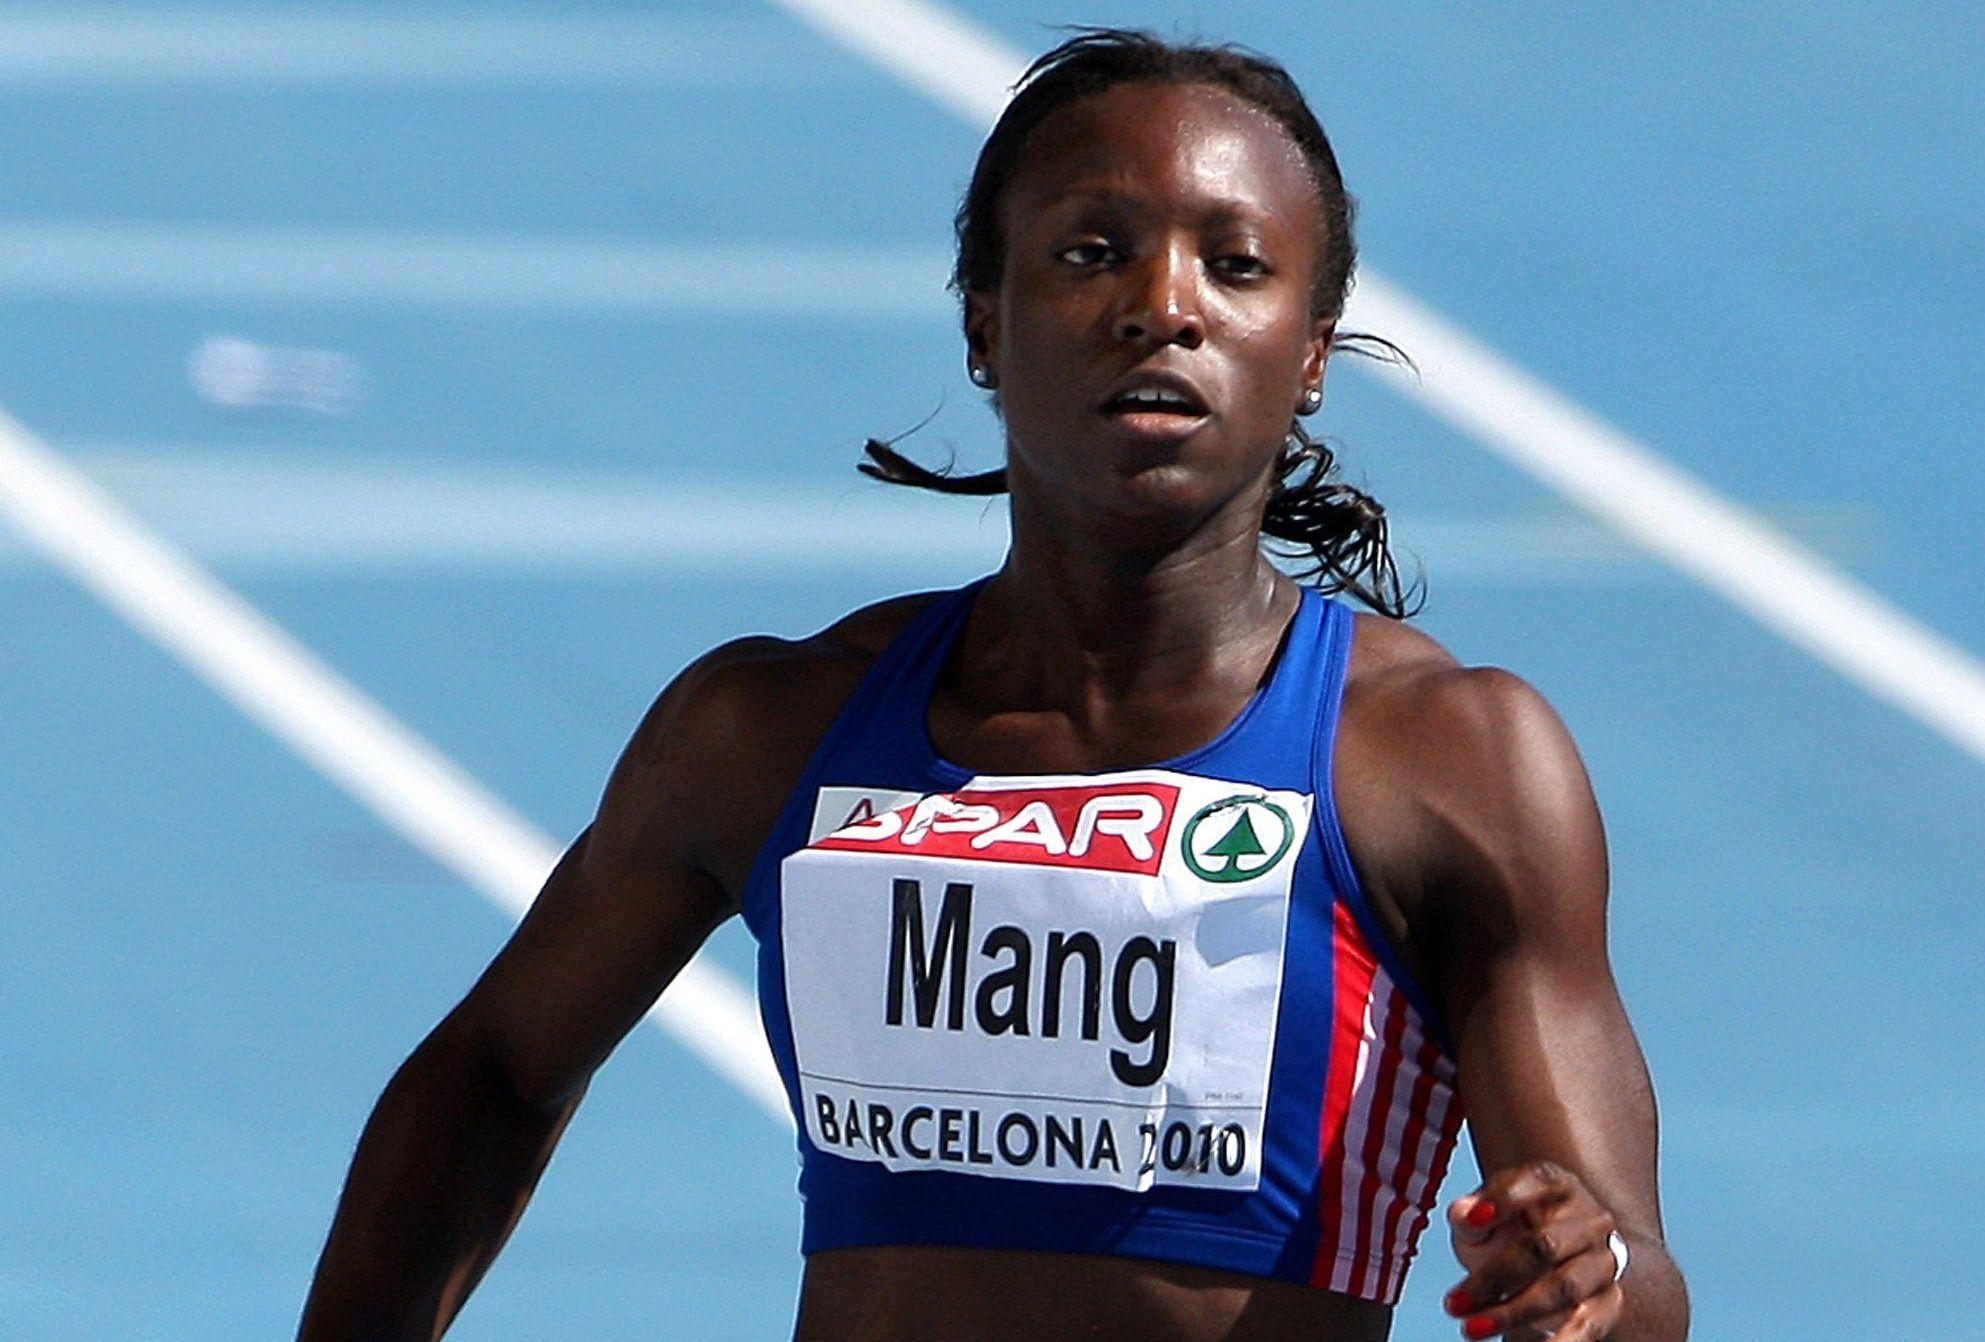 Veronique Mang, Fransız atlet